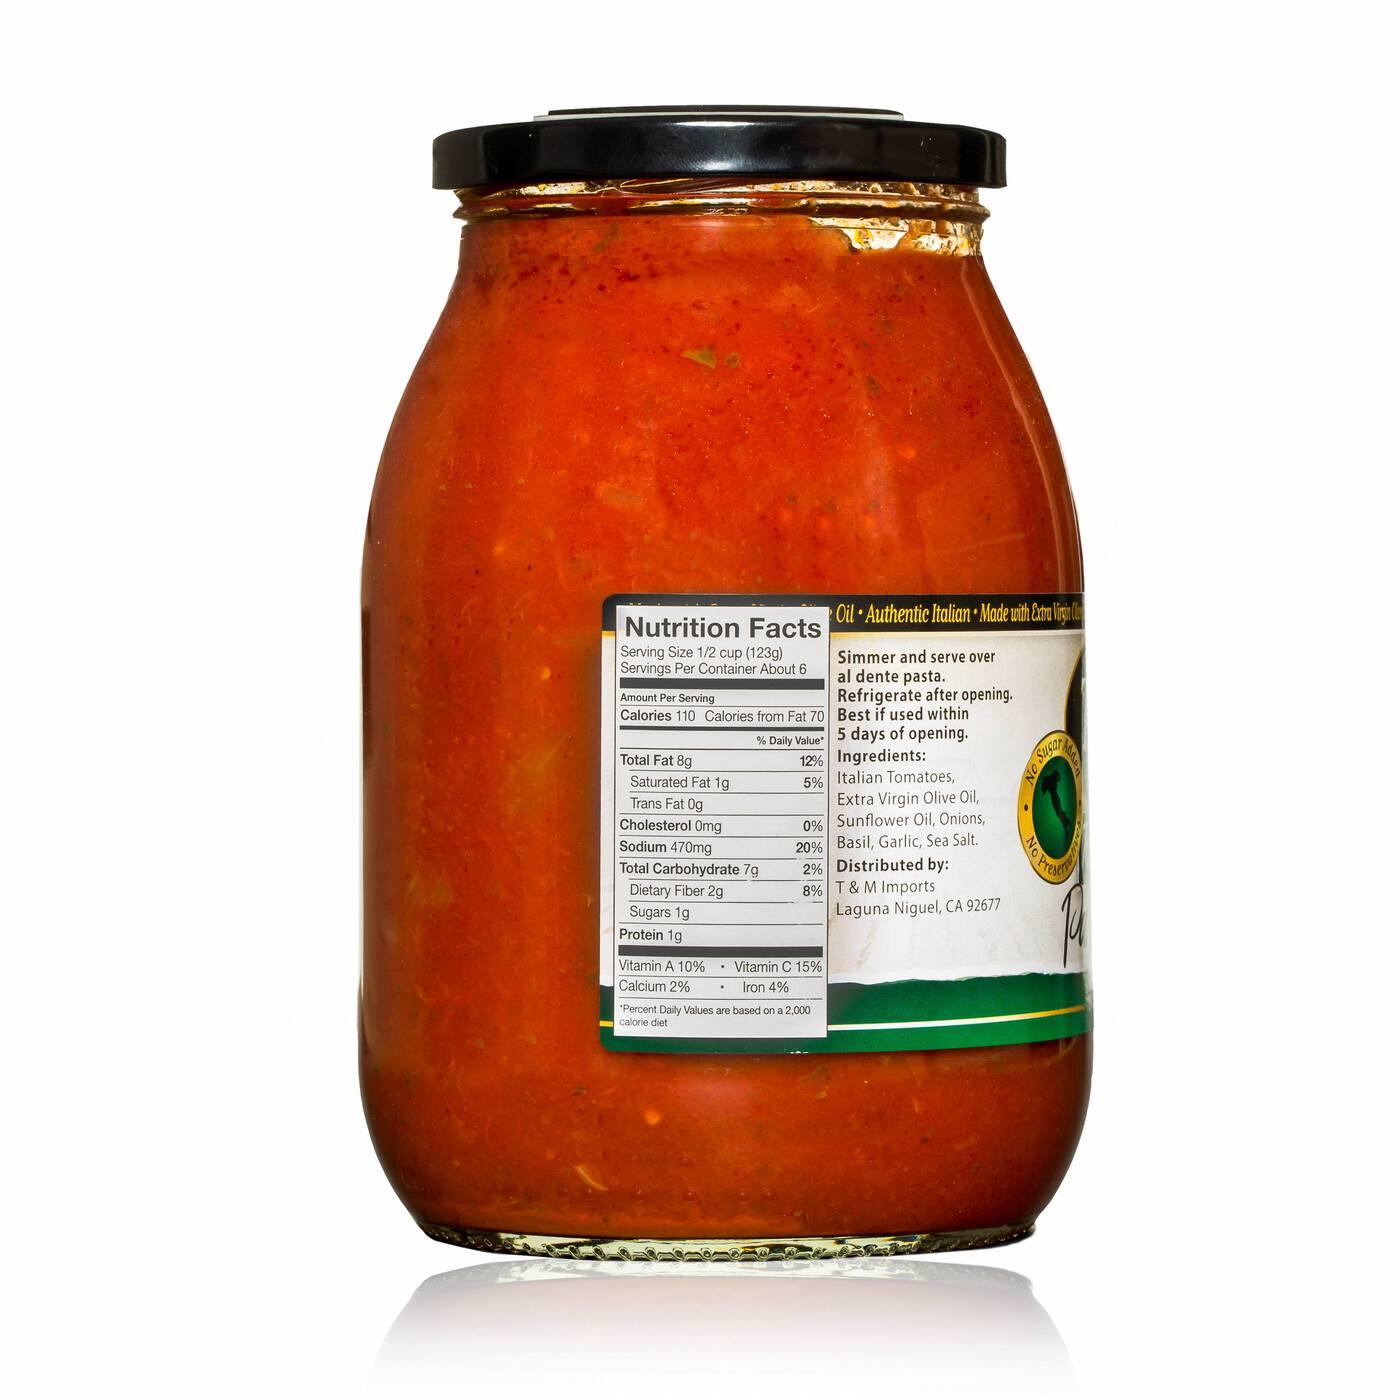 Tomato Basil Ingredients/Nutritional